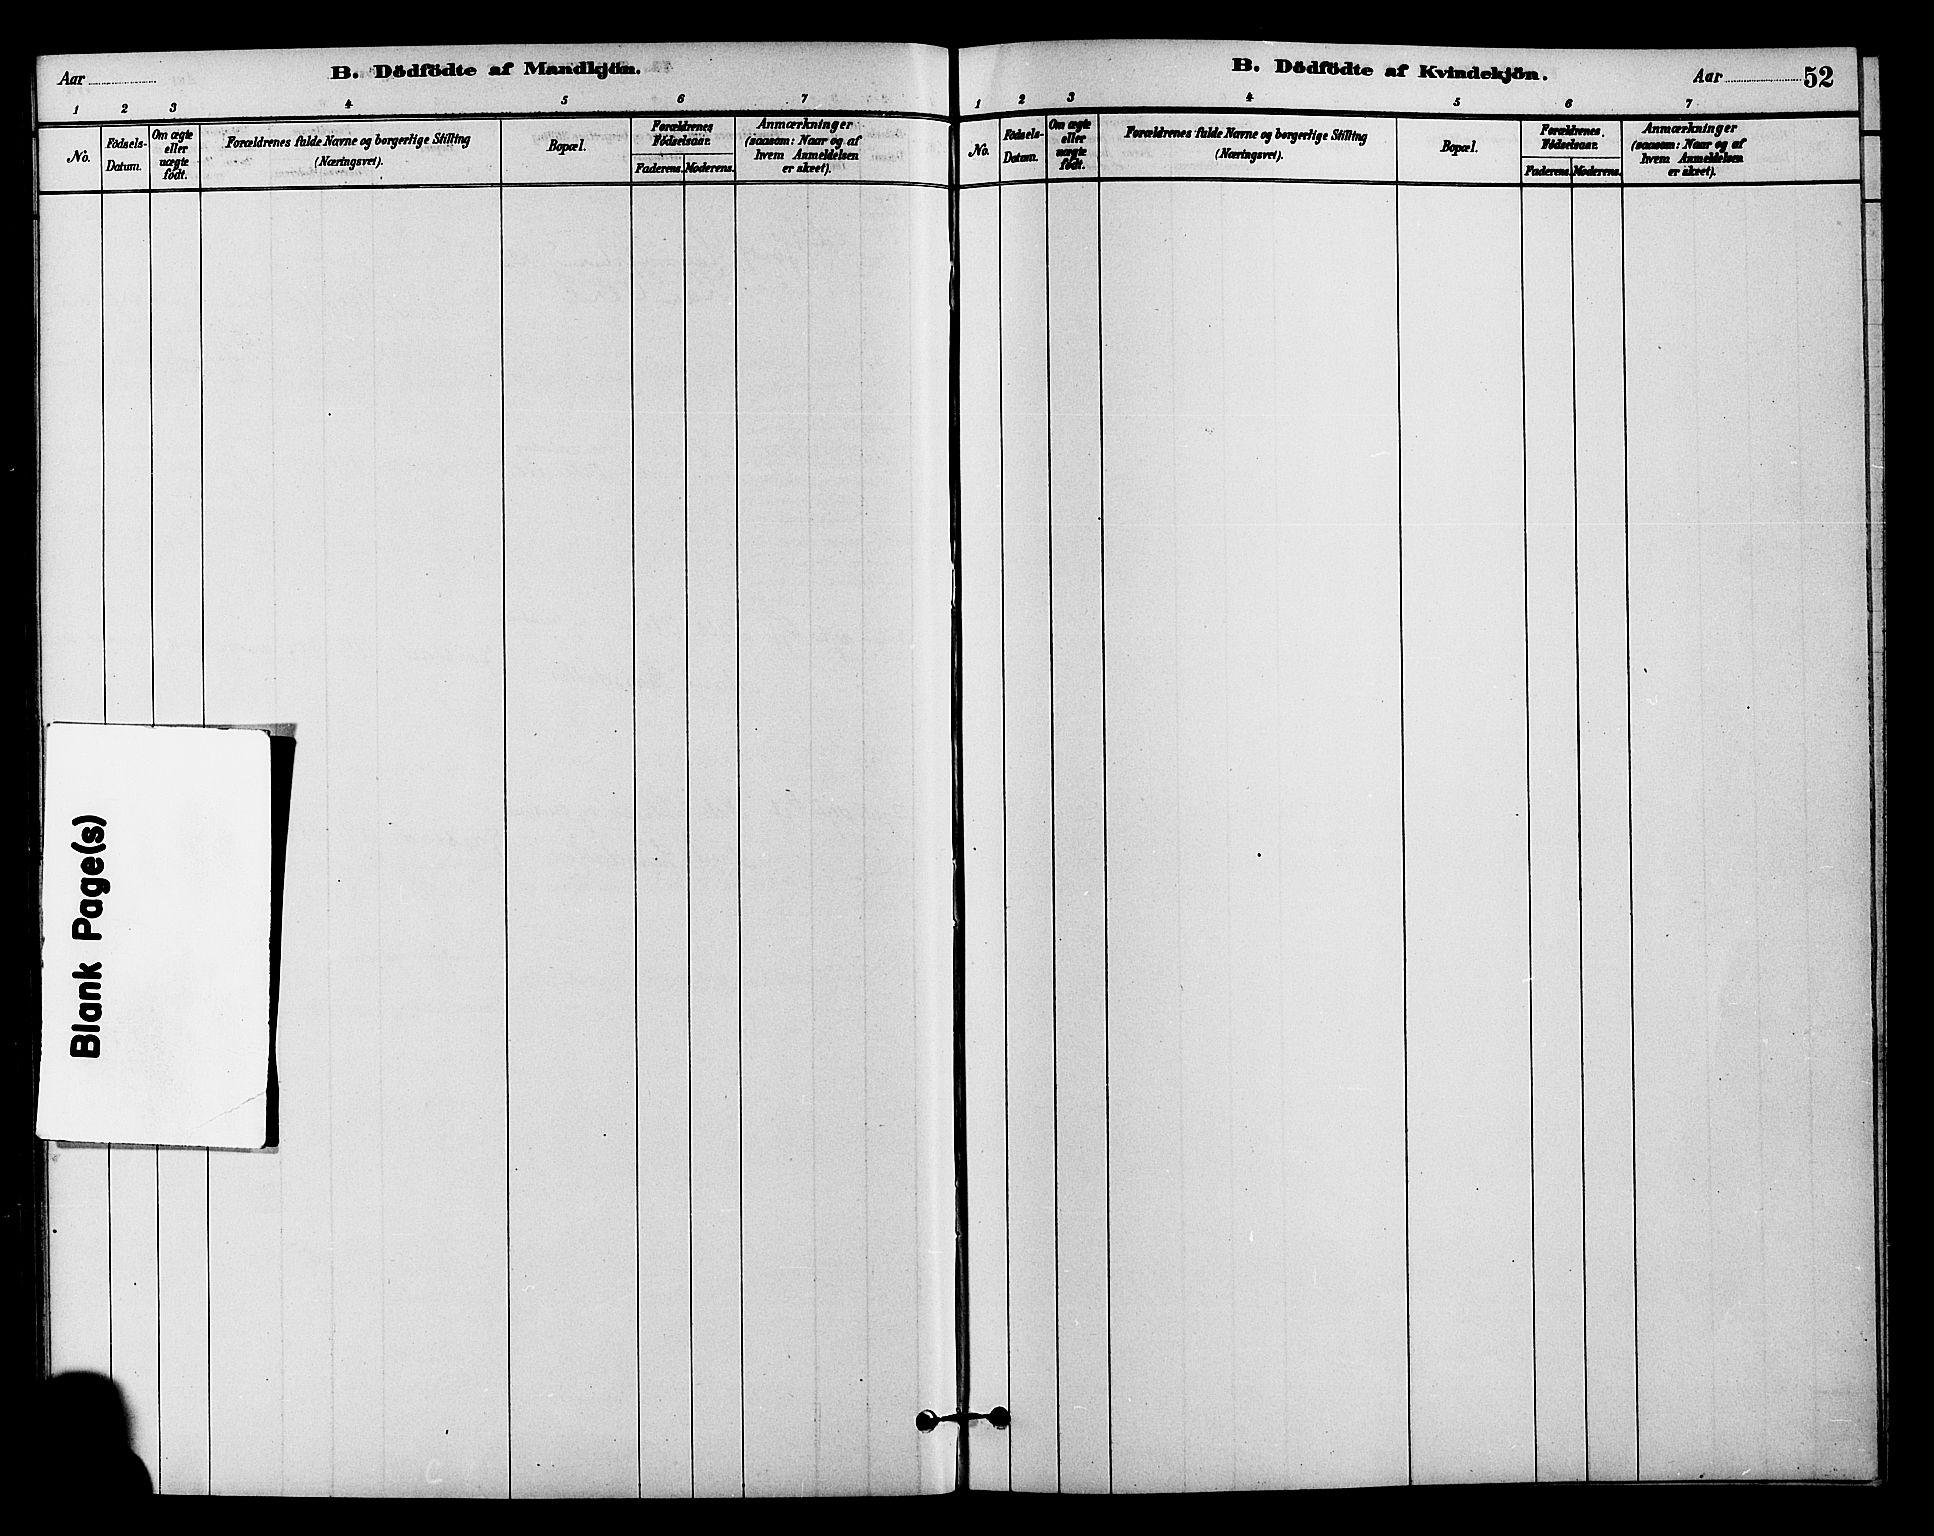 SAH, Vestre Slidre prestekontor, Klokkerbok nr. 4, 1881-1912, s. 52